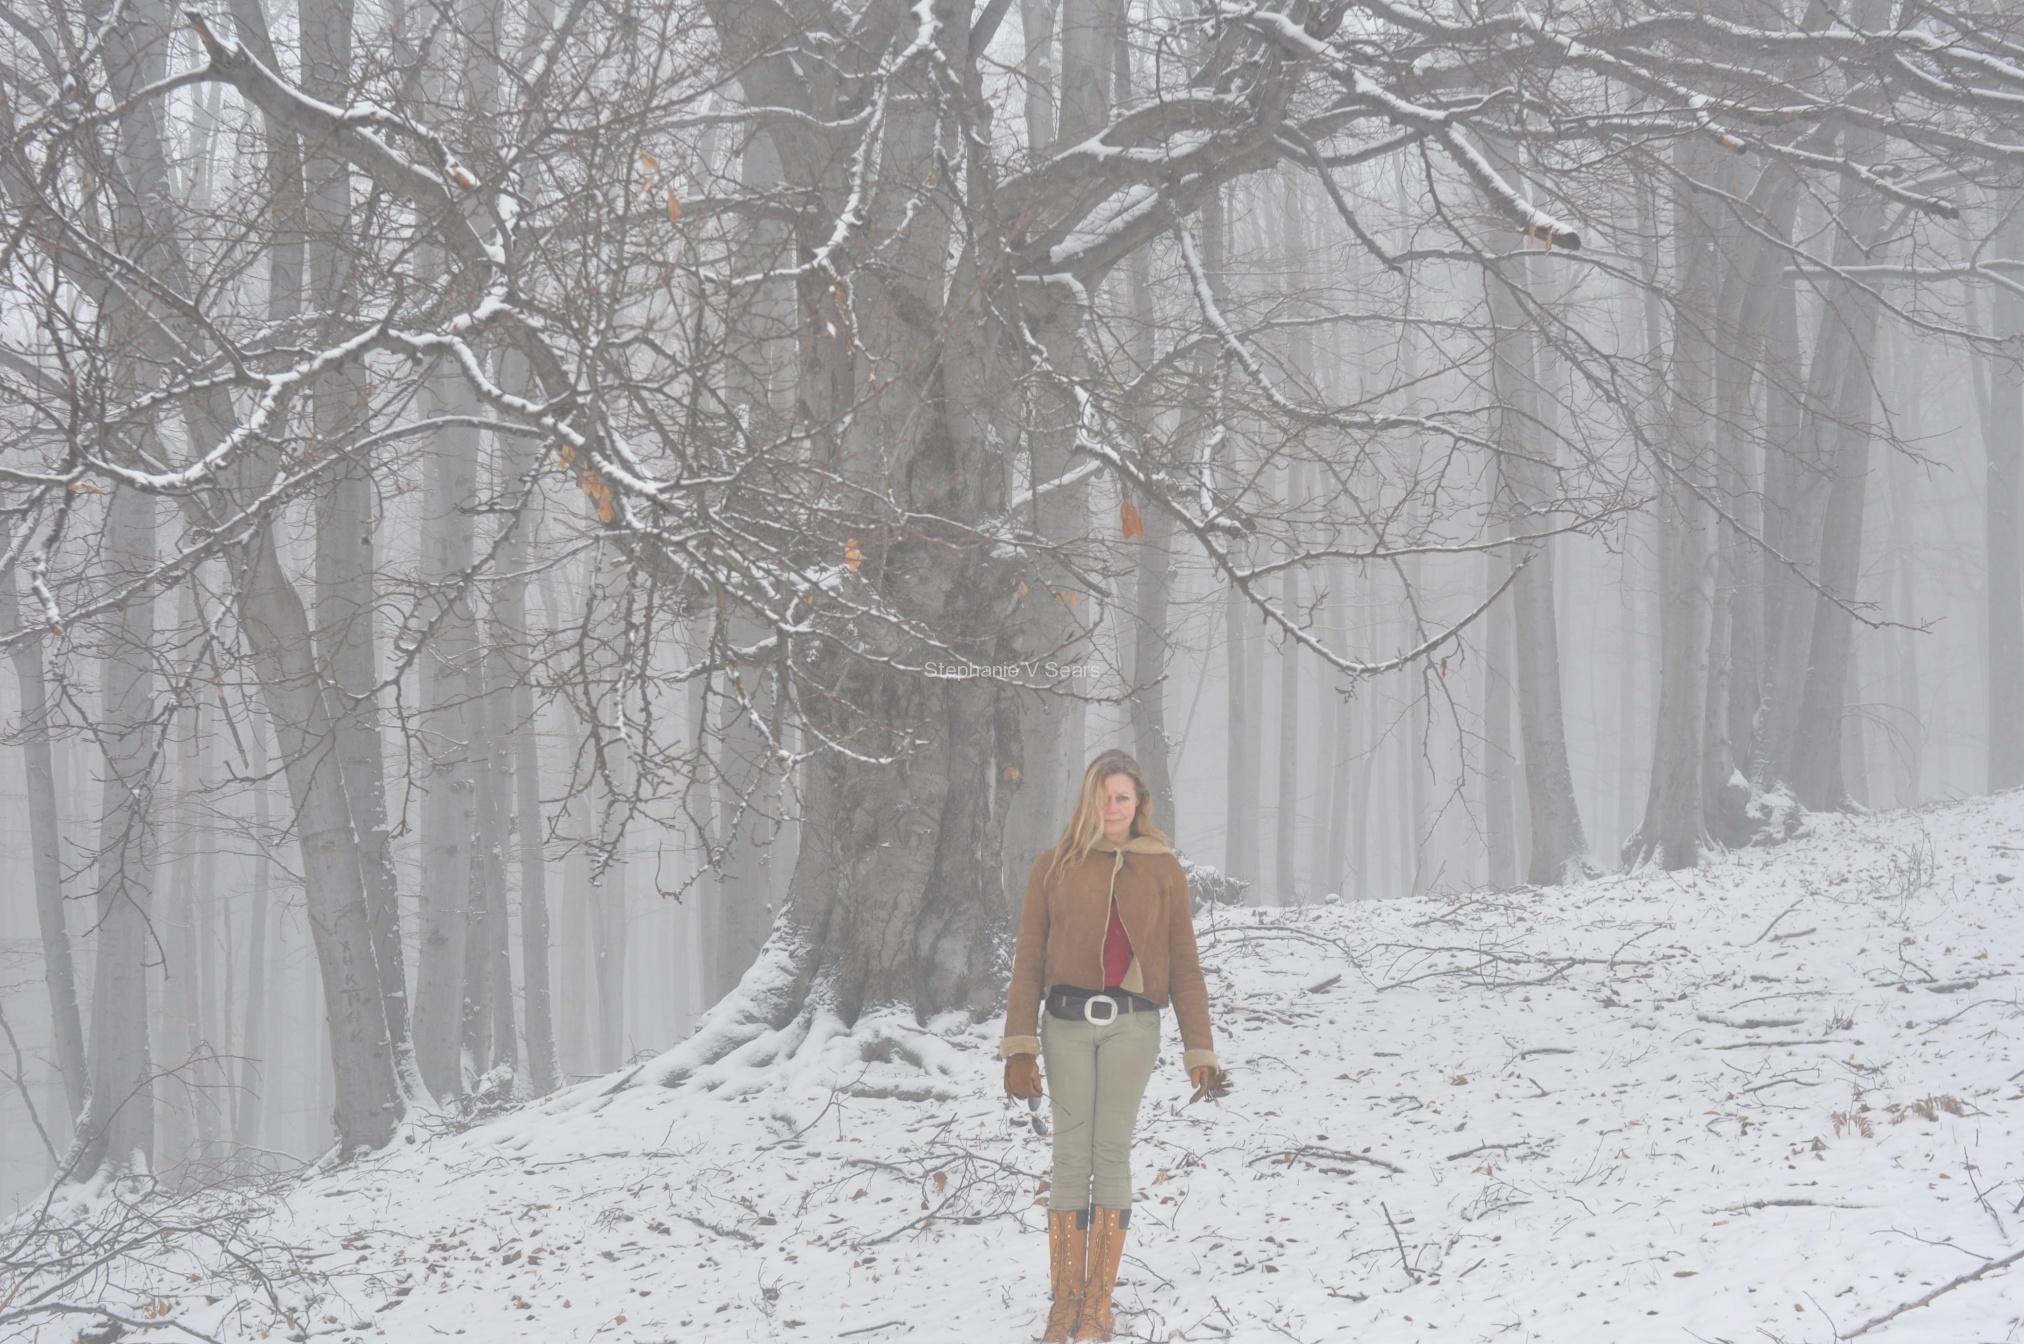 Me in Kalofer forest, Bulgaria